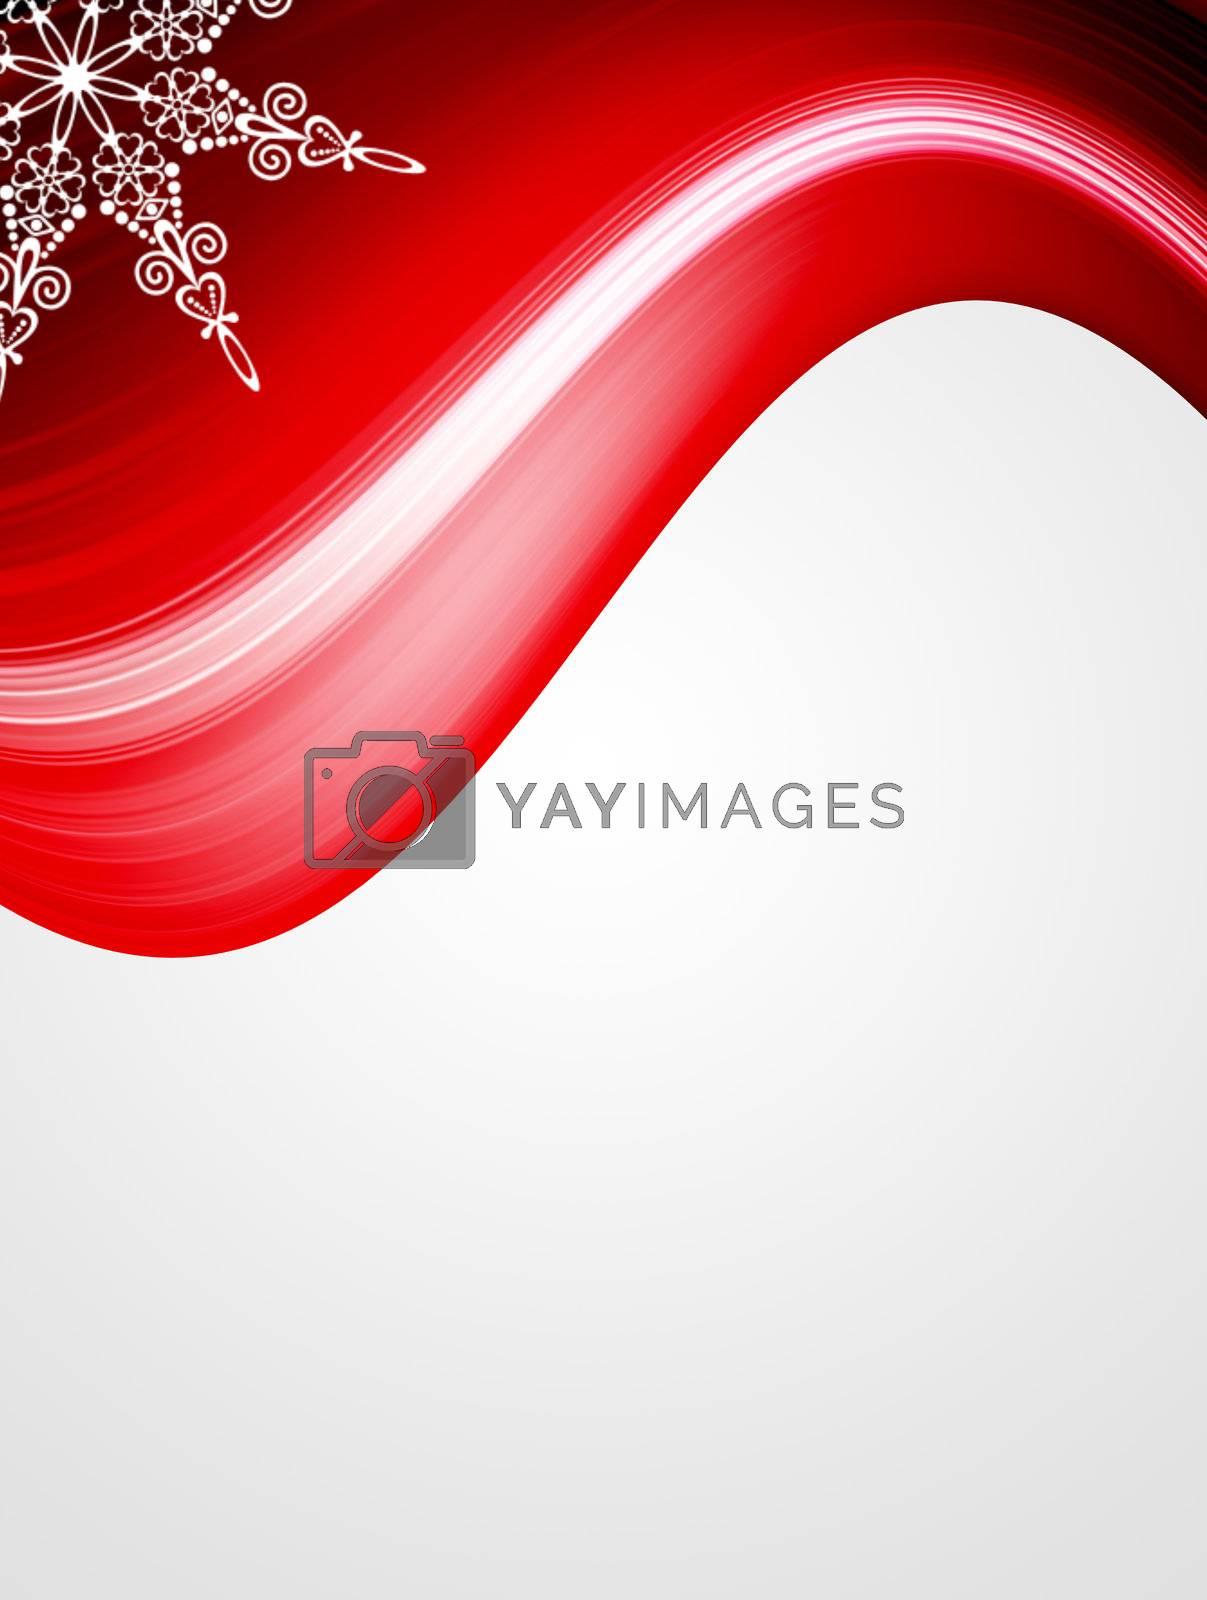 red wave background, dynamic illustration